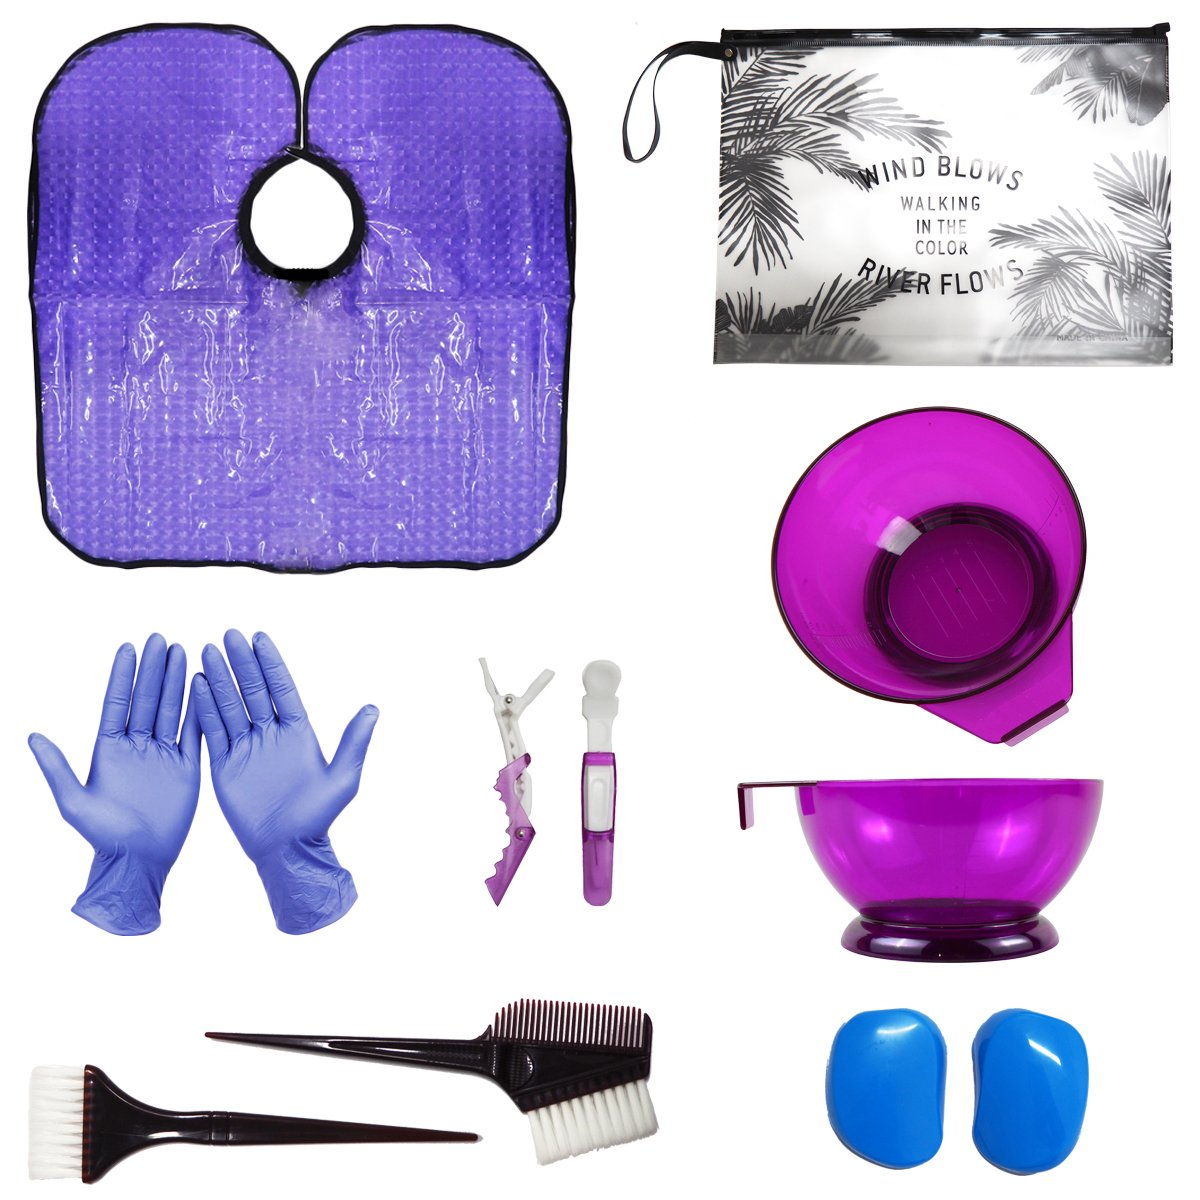 HYOUJIN 11Pcs Hair Dye Coloring DIY Tools Beauty Salon Tool Kit Includes Purple Tint Brushes & Mixing Bowl Pink Hair Clips